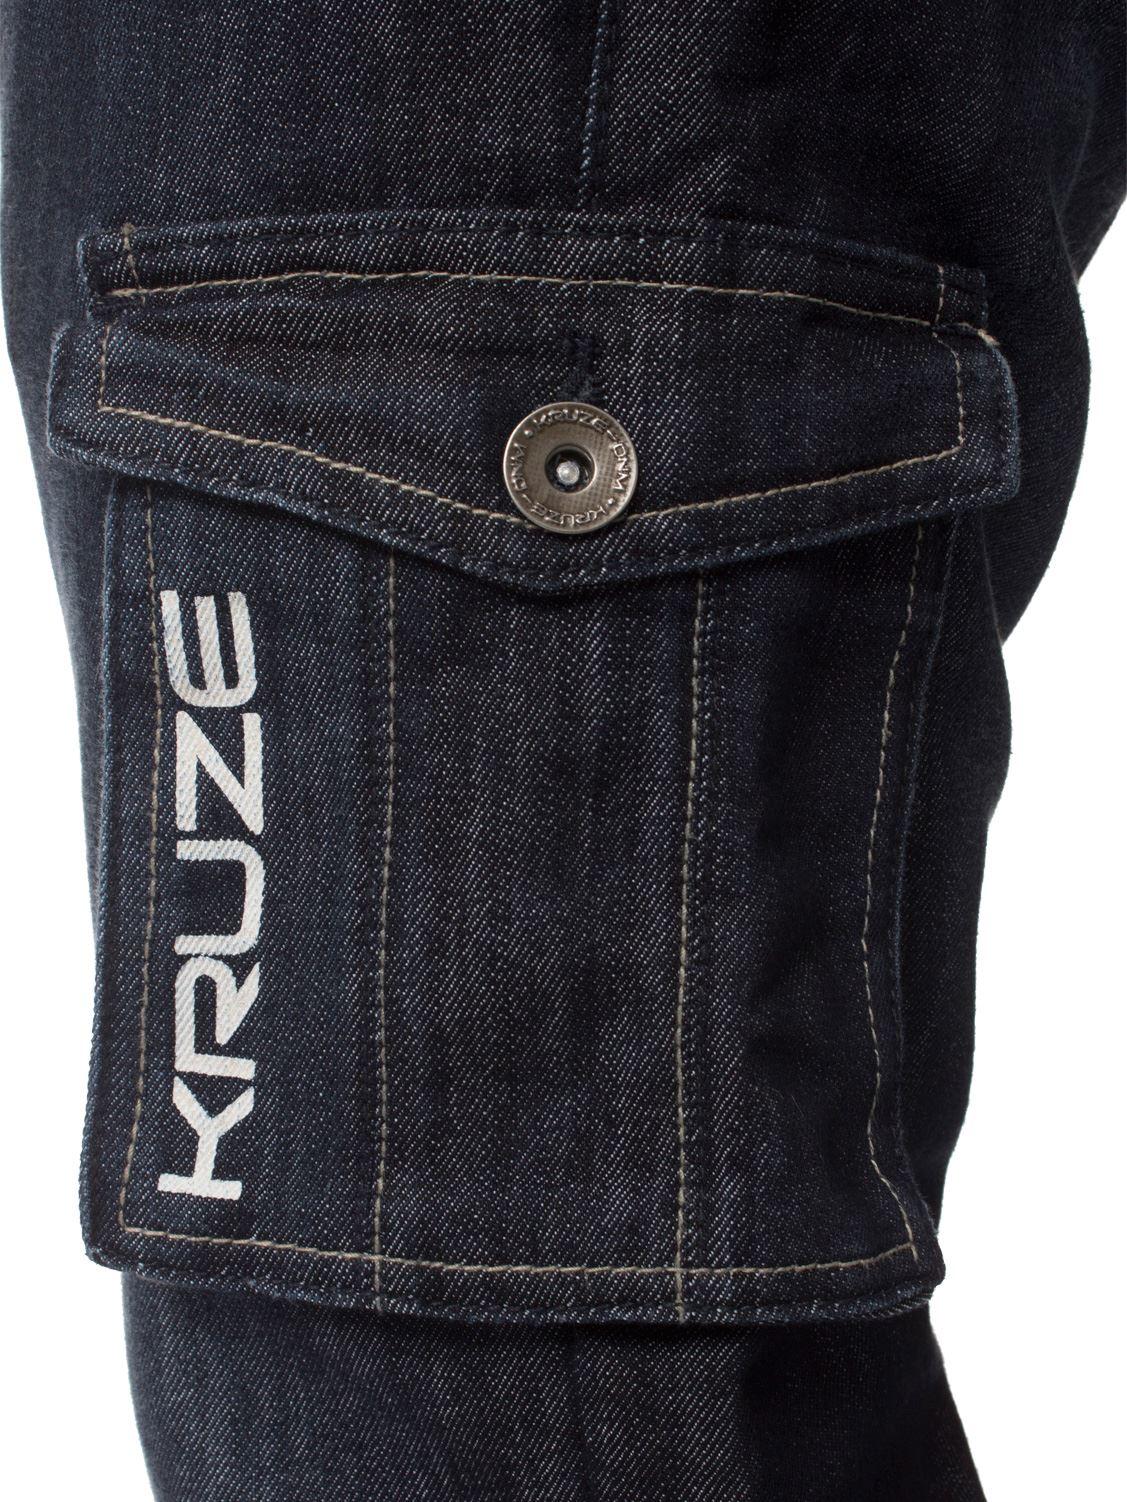 Mens-Jeans-Combate-Carga-Informal-Kruze-Trabajo-Pantalones-Cintura-Tallas-Denim-Pantalones-de-vestir miniatura 24